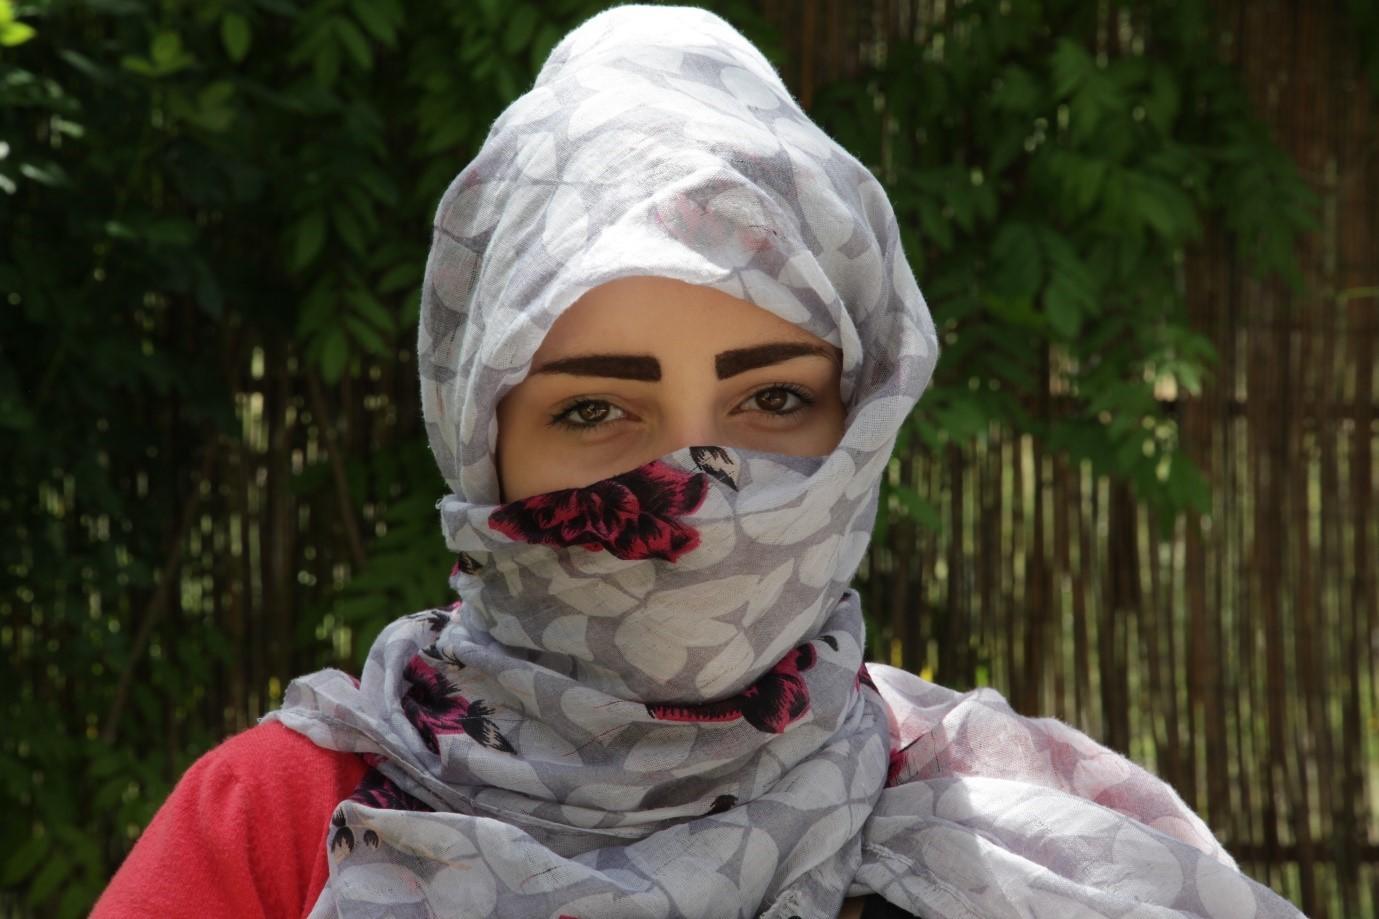 syrian refugee wearing headscarf